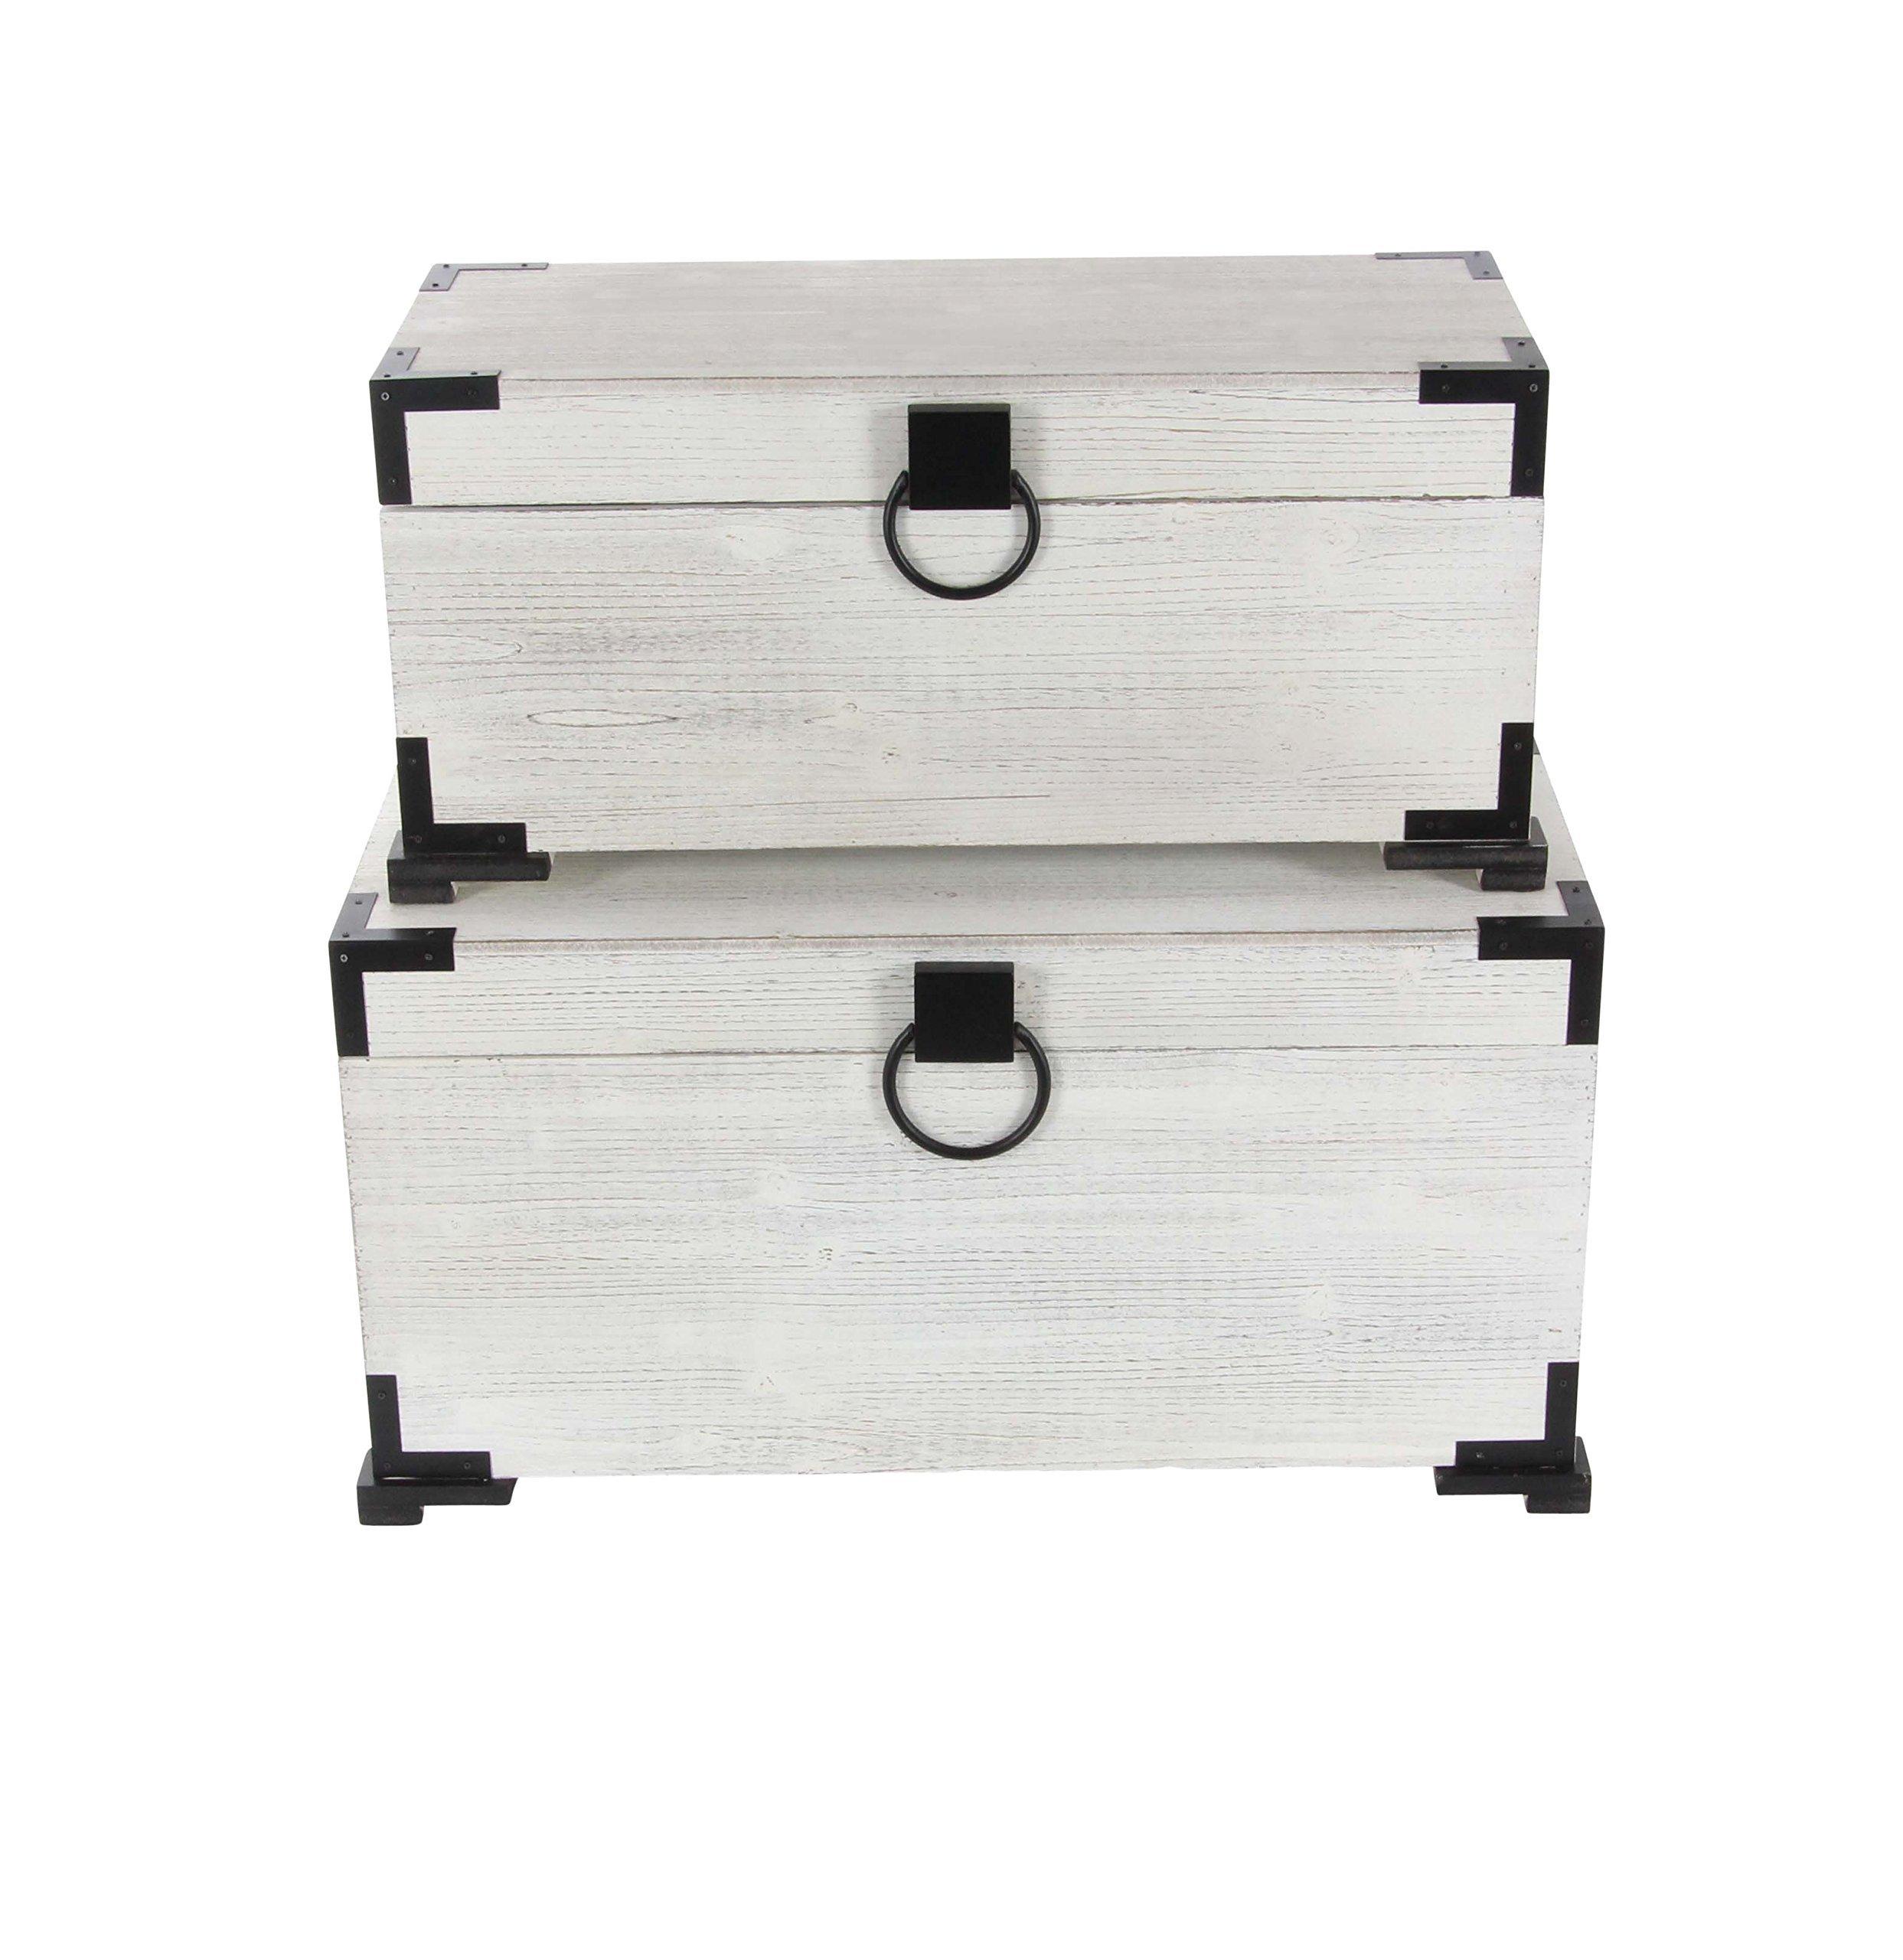 Deco 79 98152 28''/31'' Wood Trunk (Set of 2), White/Black